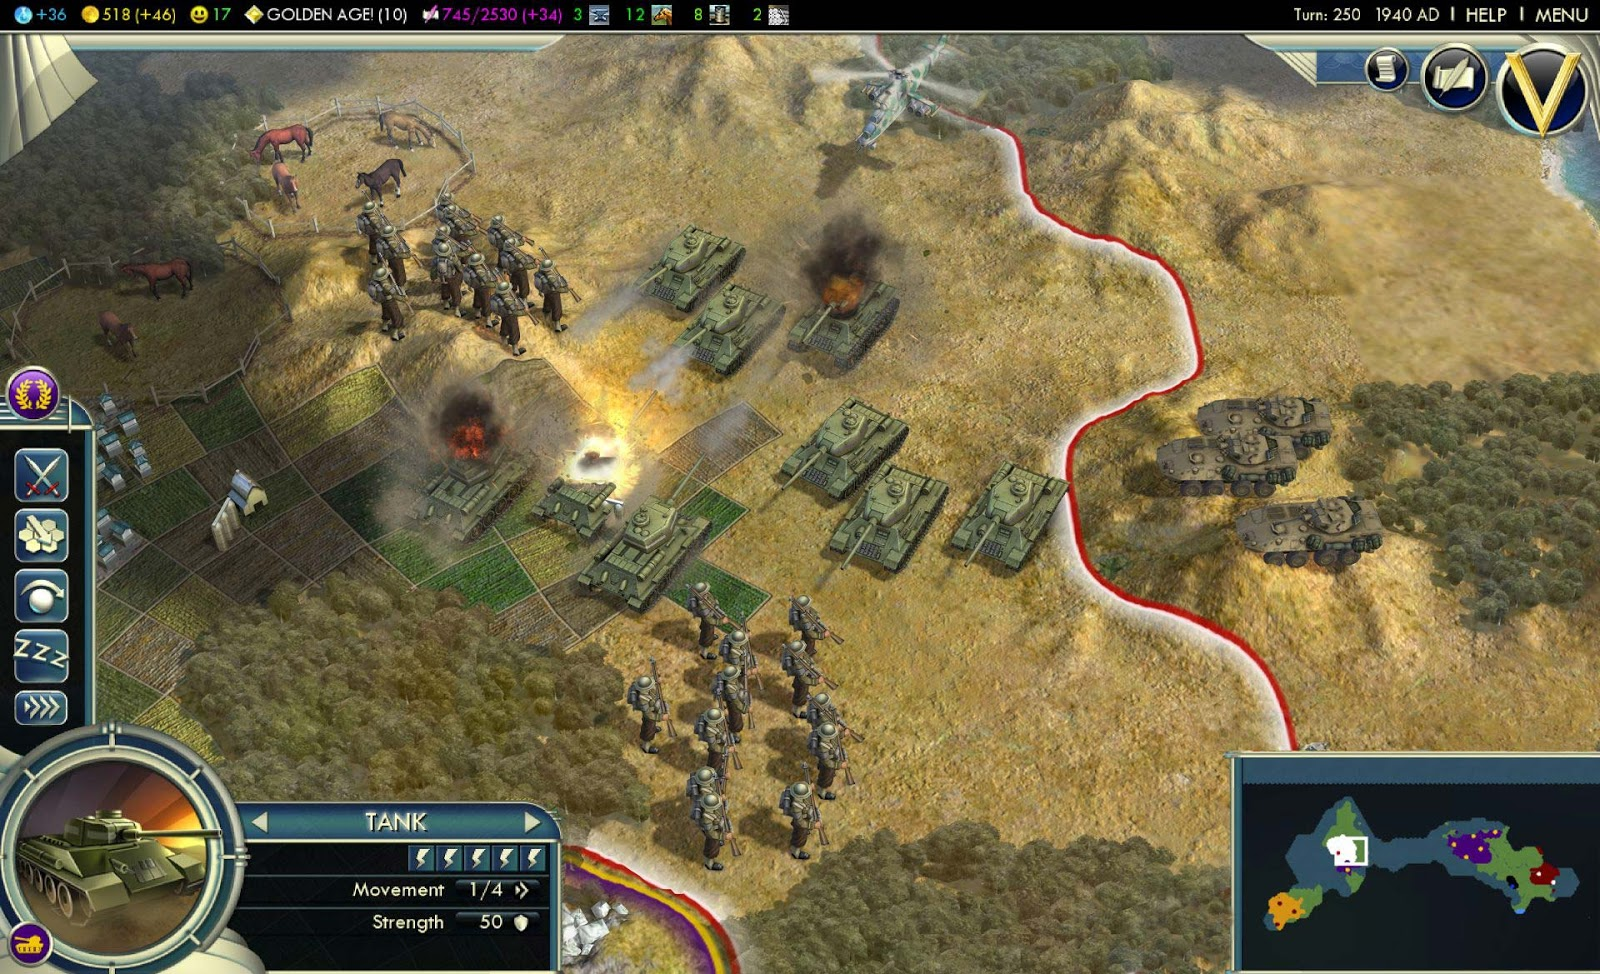 civilization 4 mac download free full game